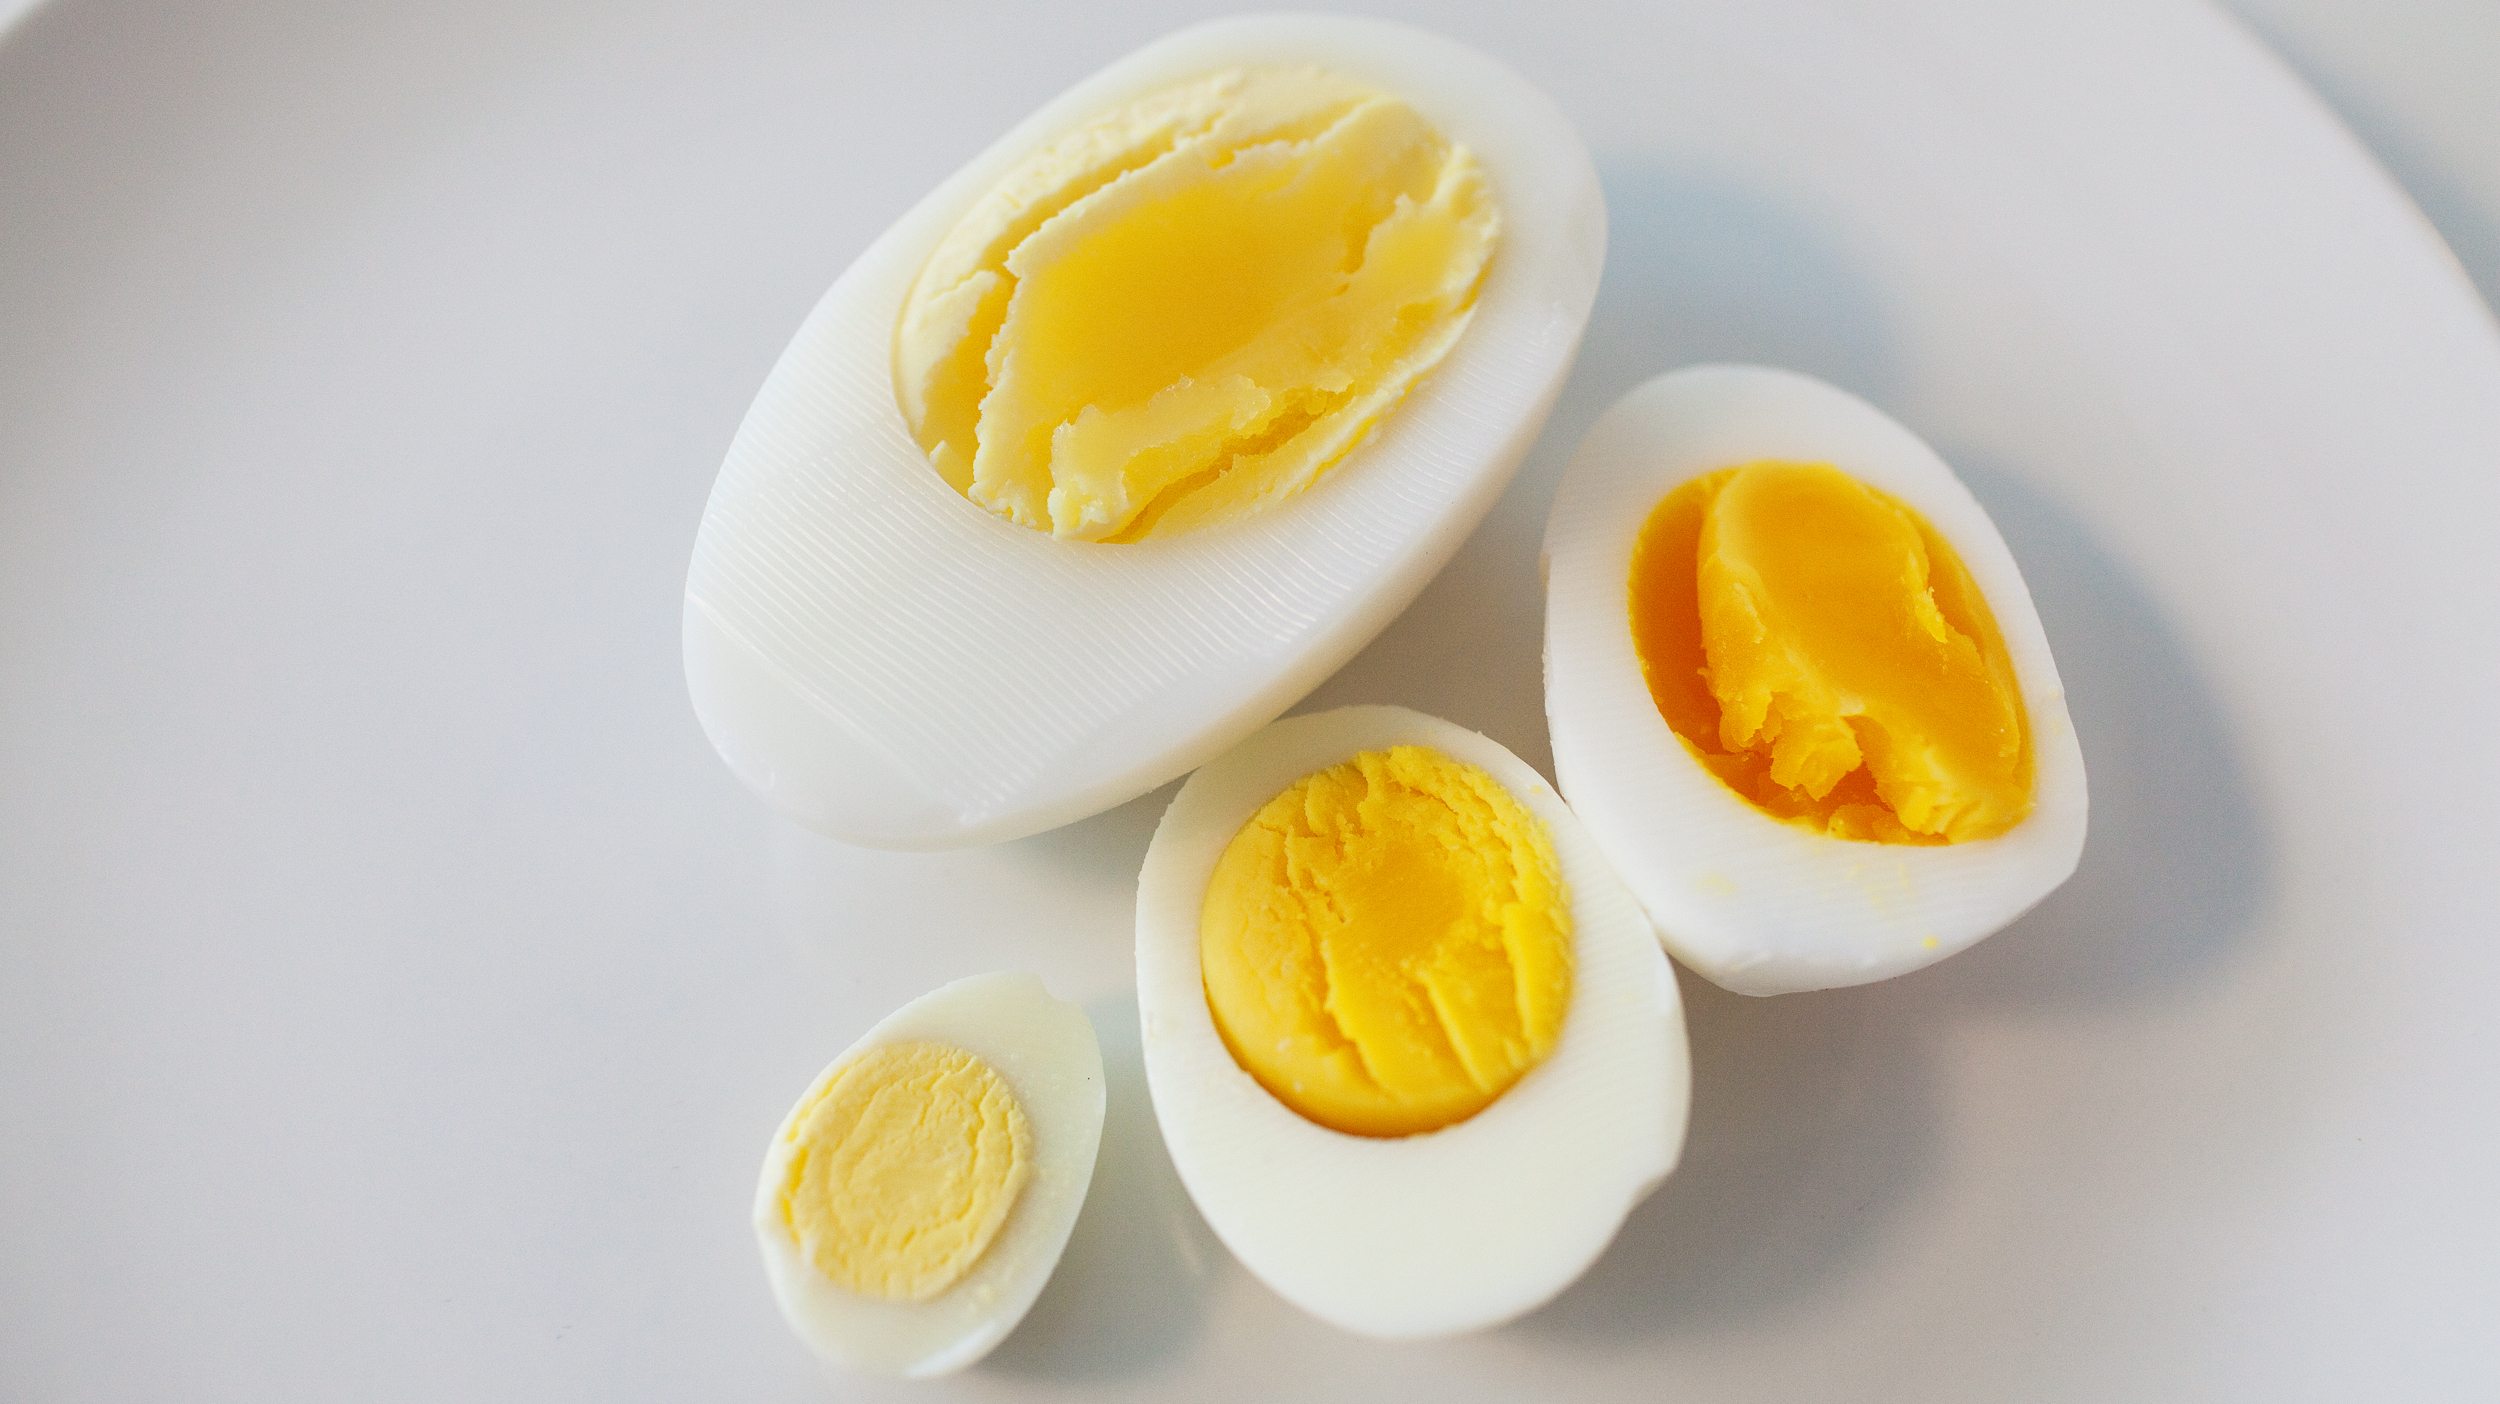 turkey eggs vs chicken eggs